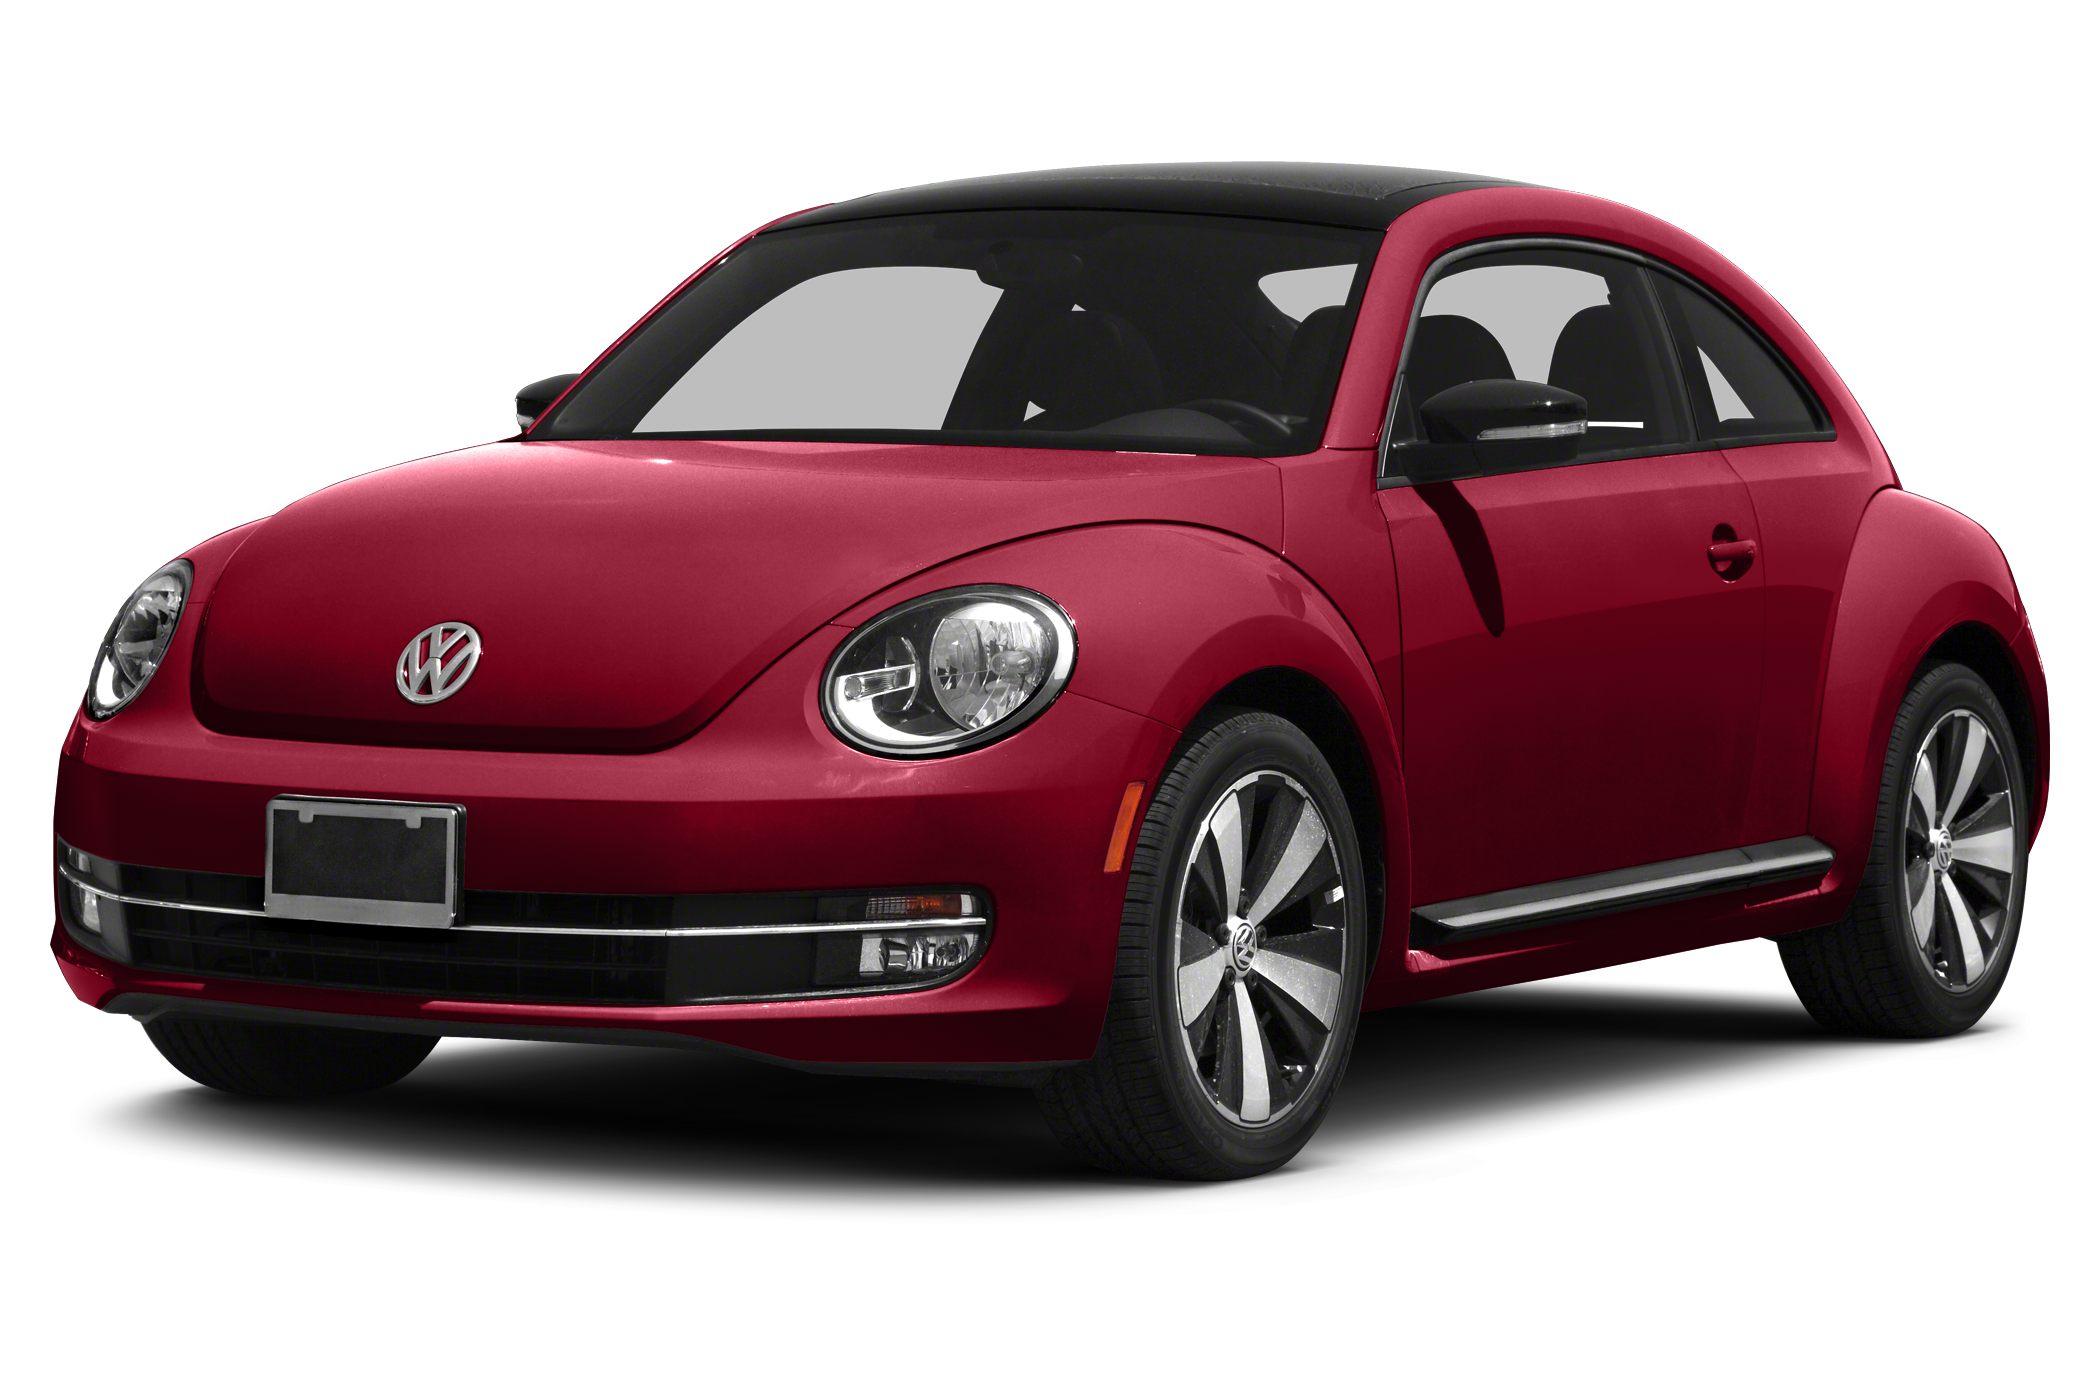 2012 Volkswagen Beetle 20T Beetle 20 TSi Launch Edition 2D Hatchback 20L 200 hp 6-Speed Auto